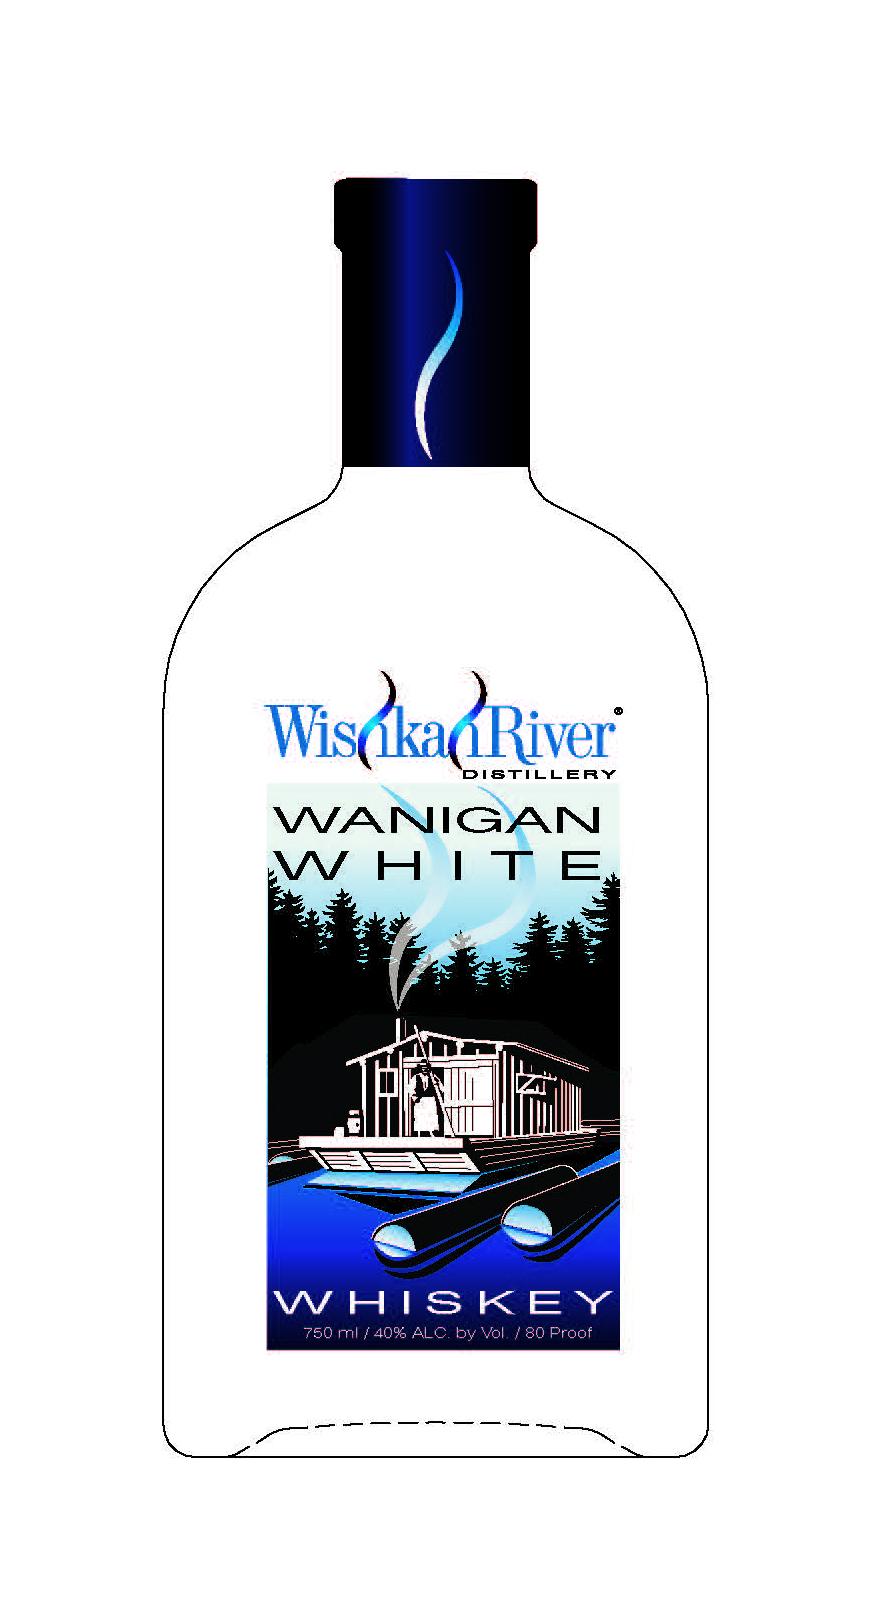 Wishkah River Distillery Wanigan White Whiskey Label